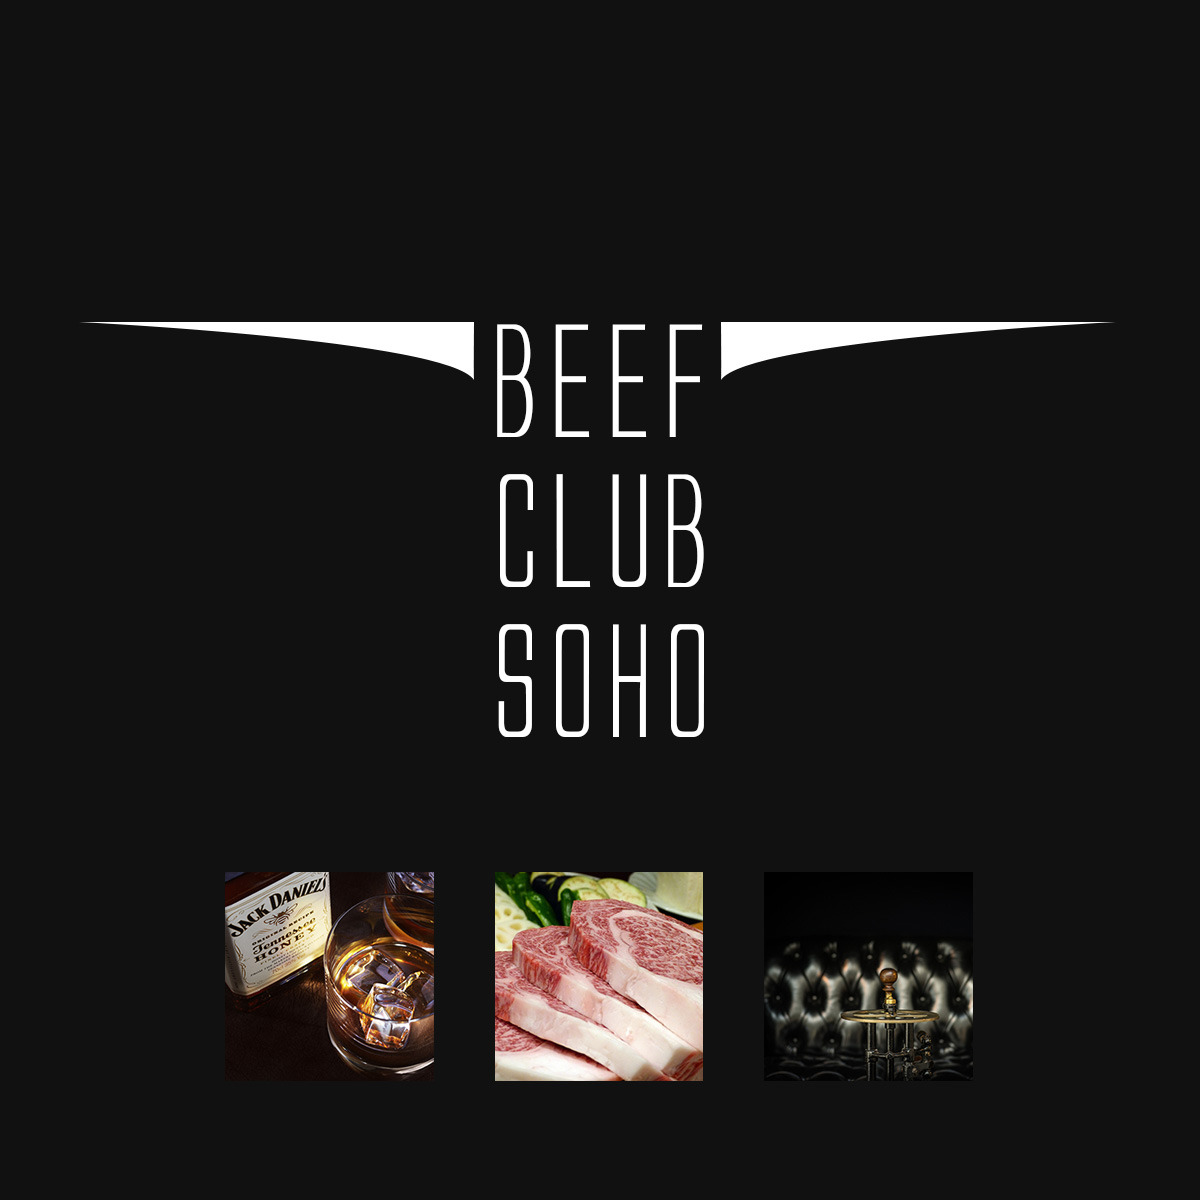 BEEF CLUB NEWS